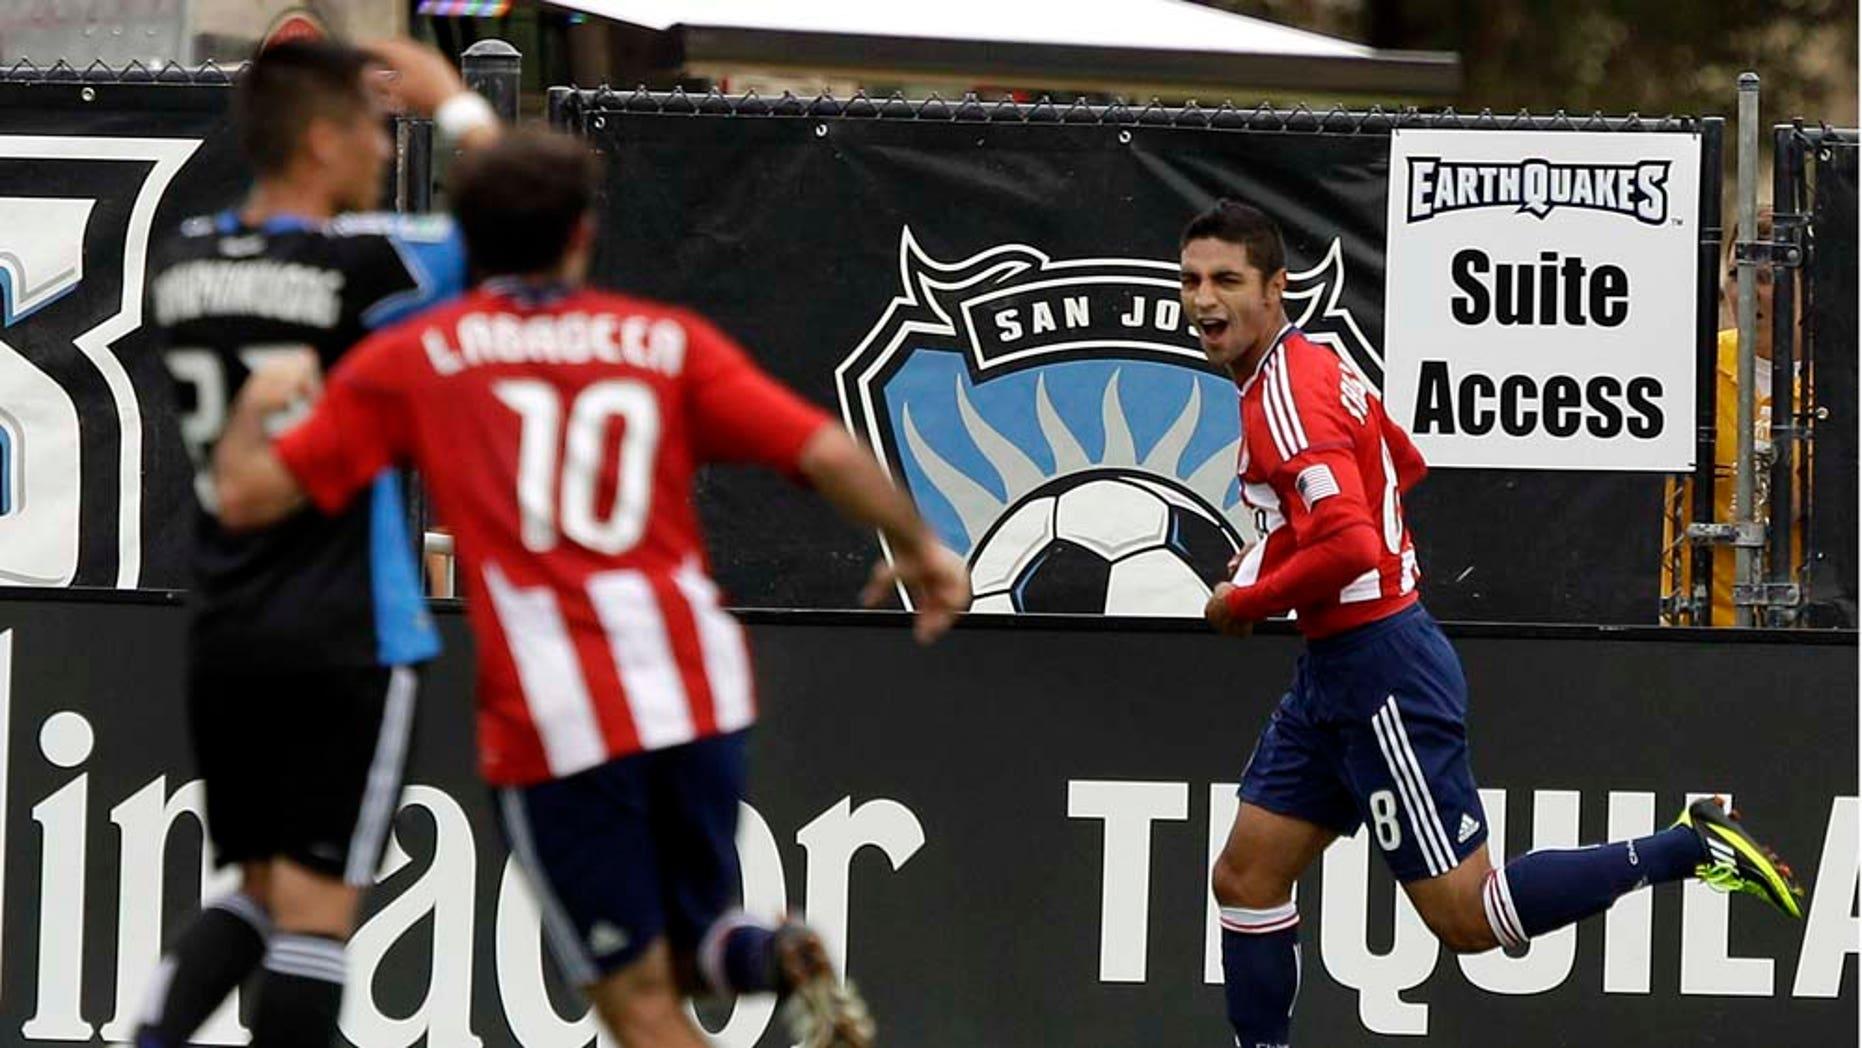 Chivas USA's Mariano Trujillo (8) celebrates after scoring against the San Jose Earthquakes during the second half of an MLS soccer game in Santa Clara, Calif., Saturday, April 23, 2011. Chivas USA won 2-1. (AP Photo/Marcio Jose Sanchez)